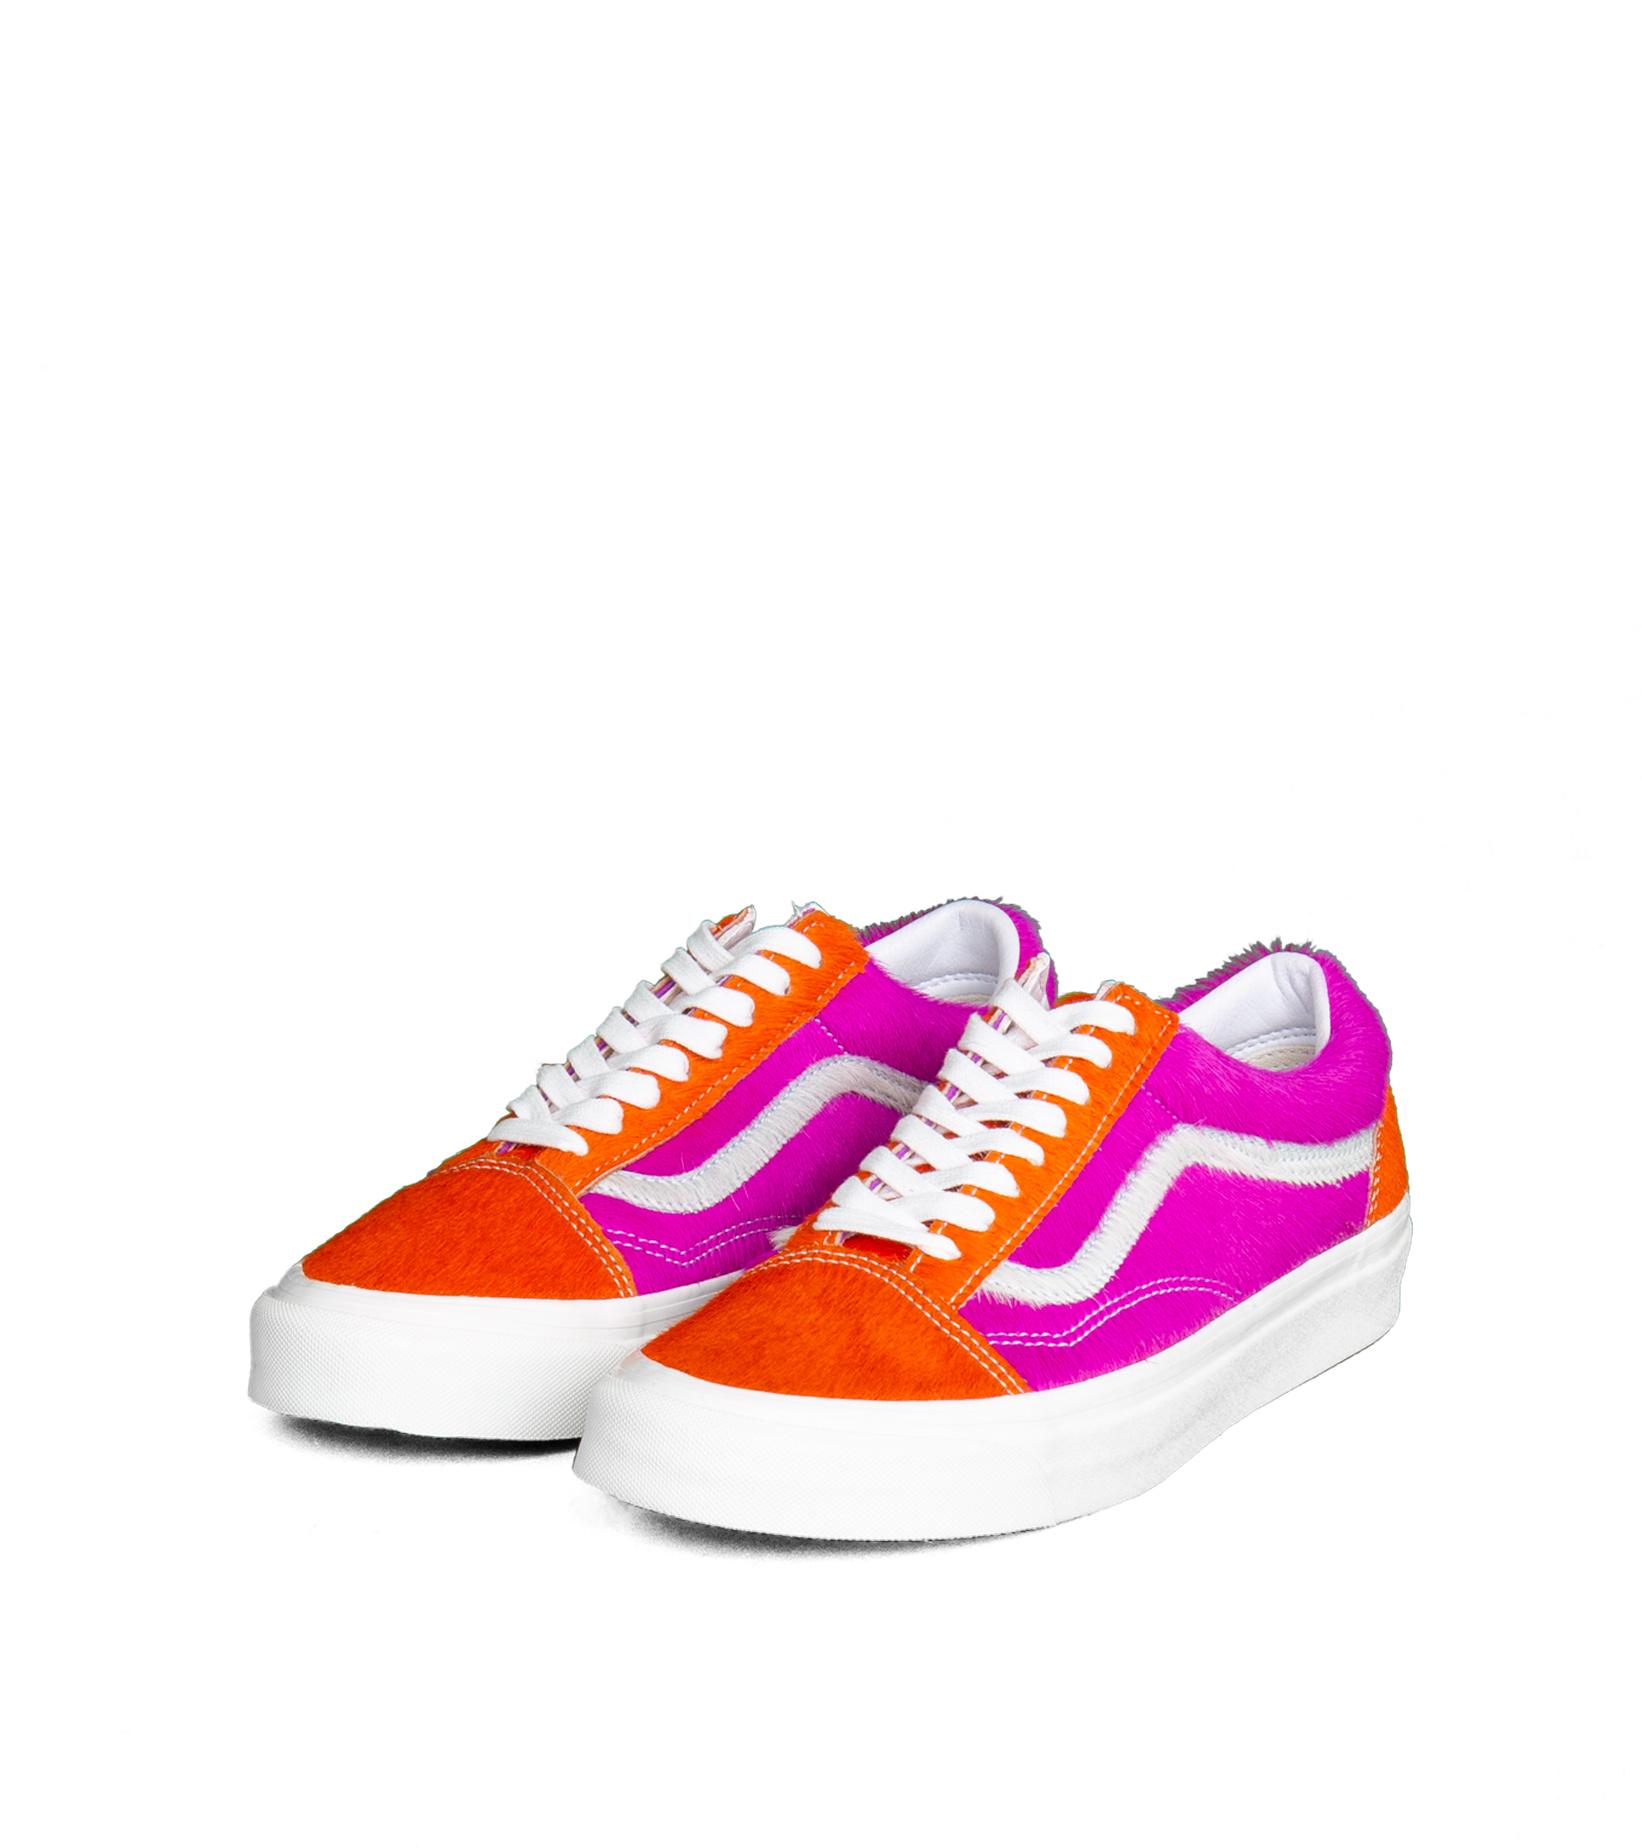 "Old Skool 36 DX (Anaheim Factory) ""Pink Pony/True White""-1"